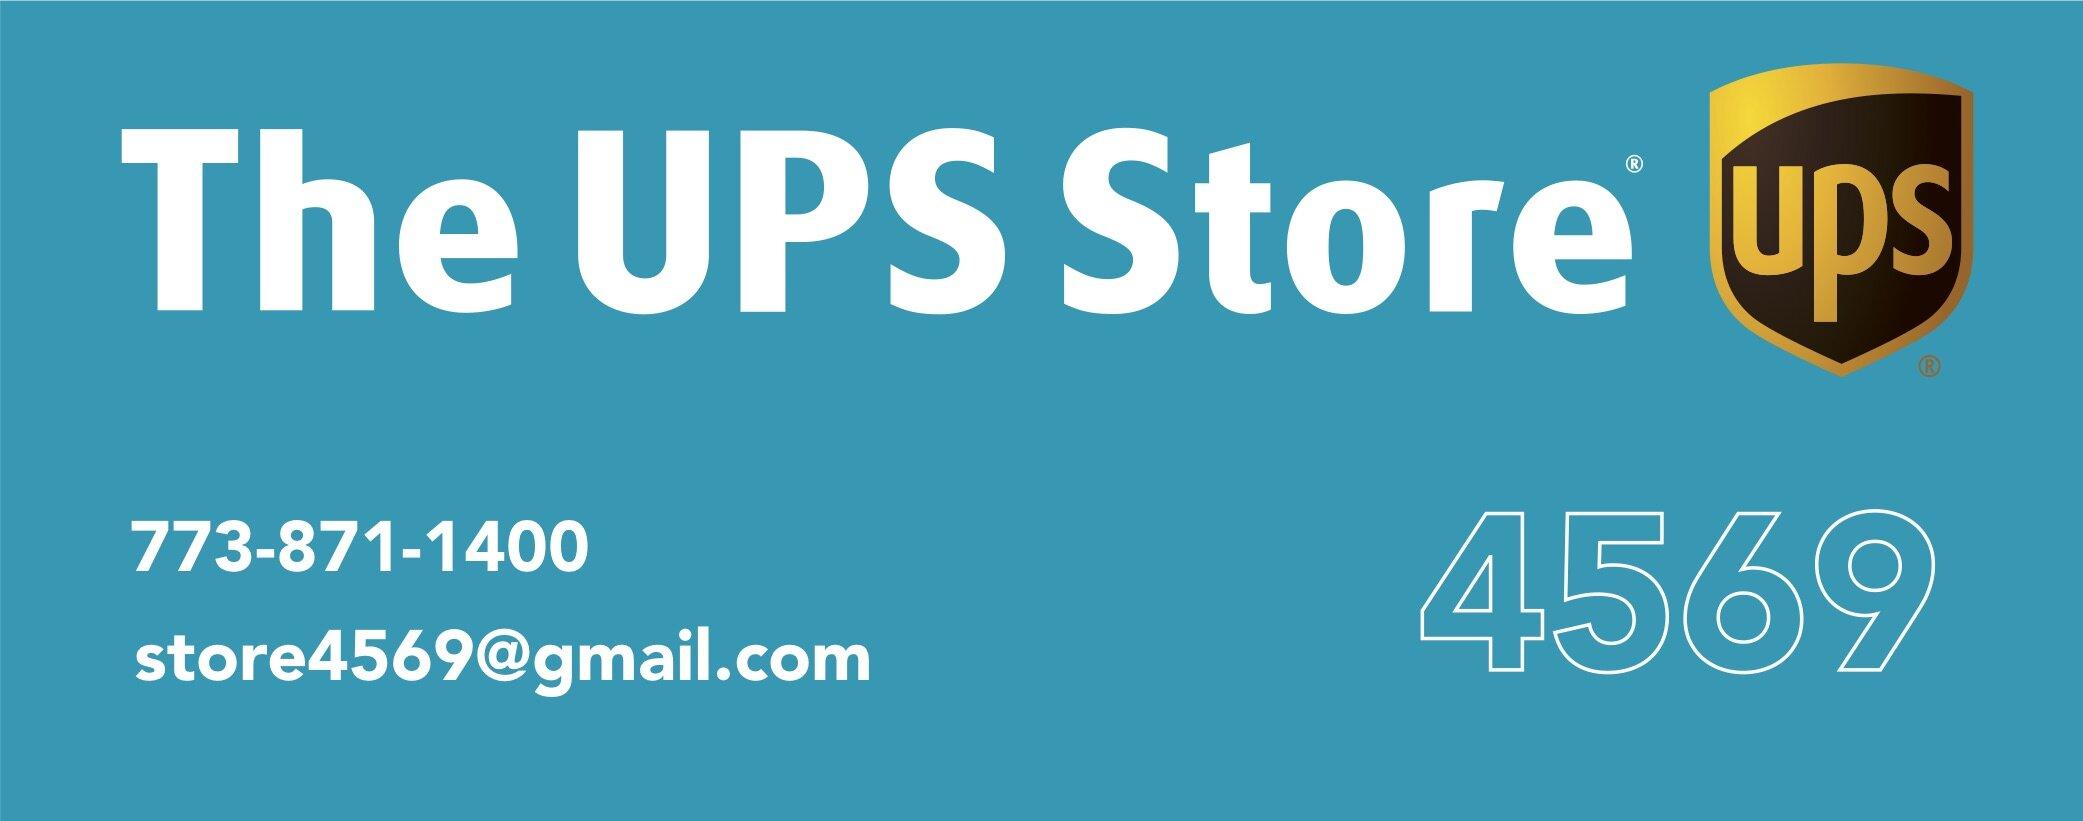 UPS Store Logo with Info.jpg